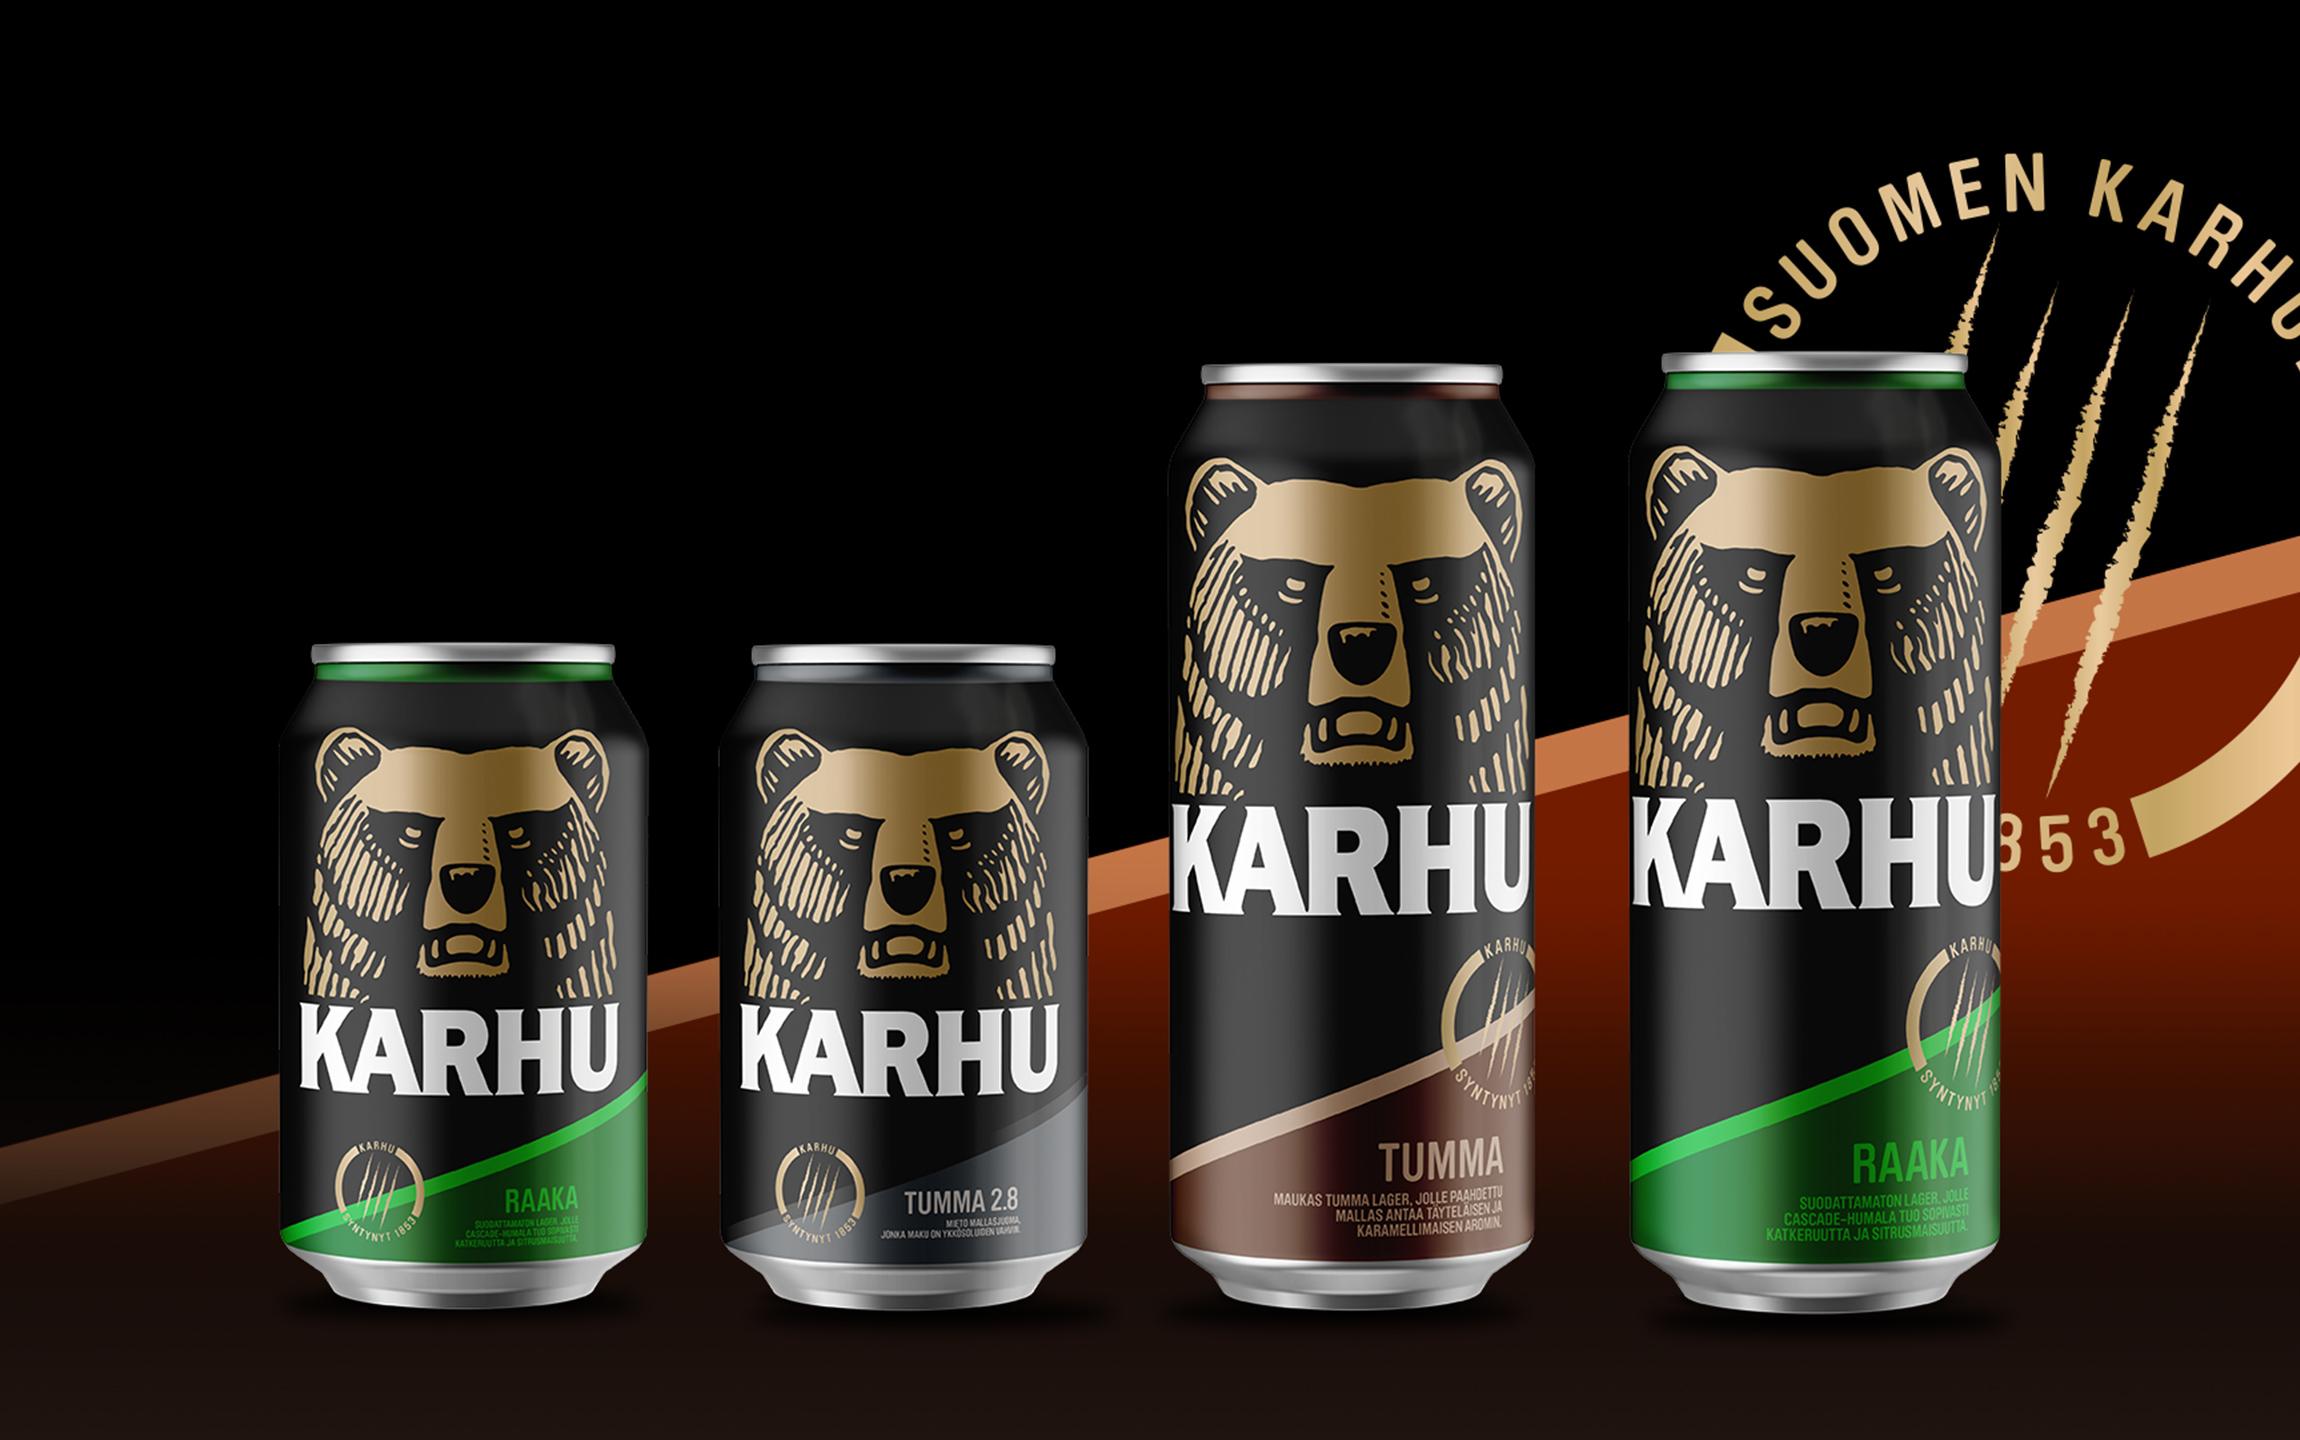 180601_keyvisual_karhu_expl